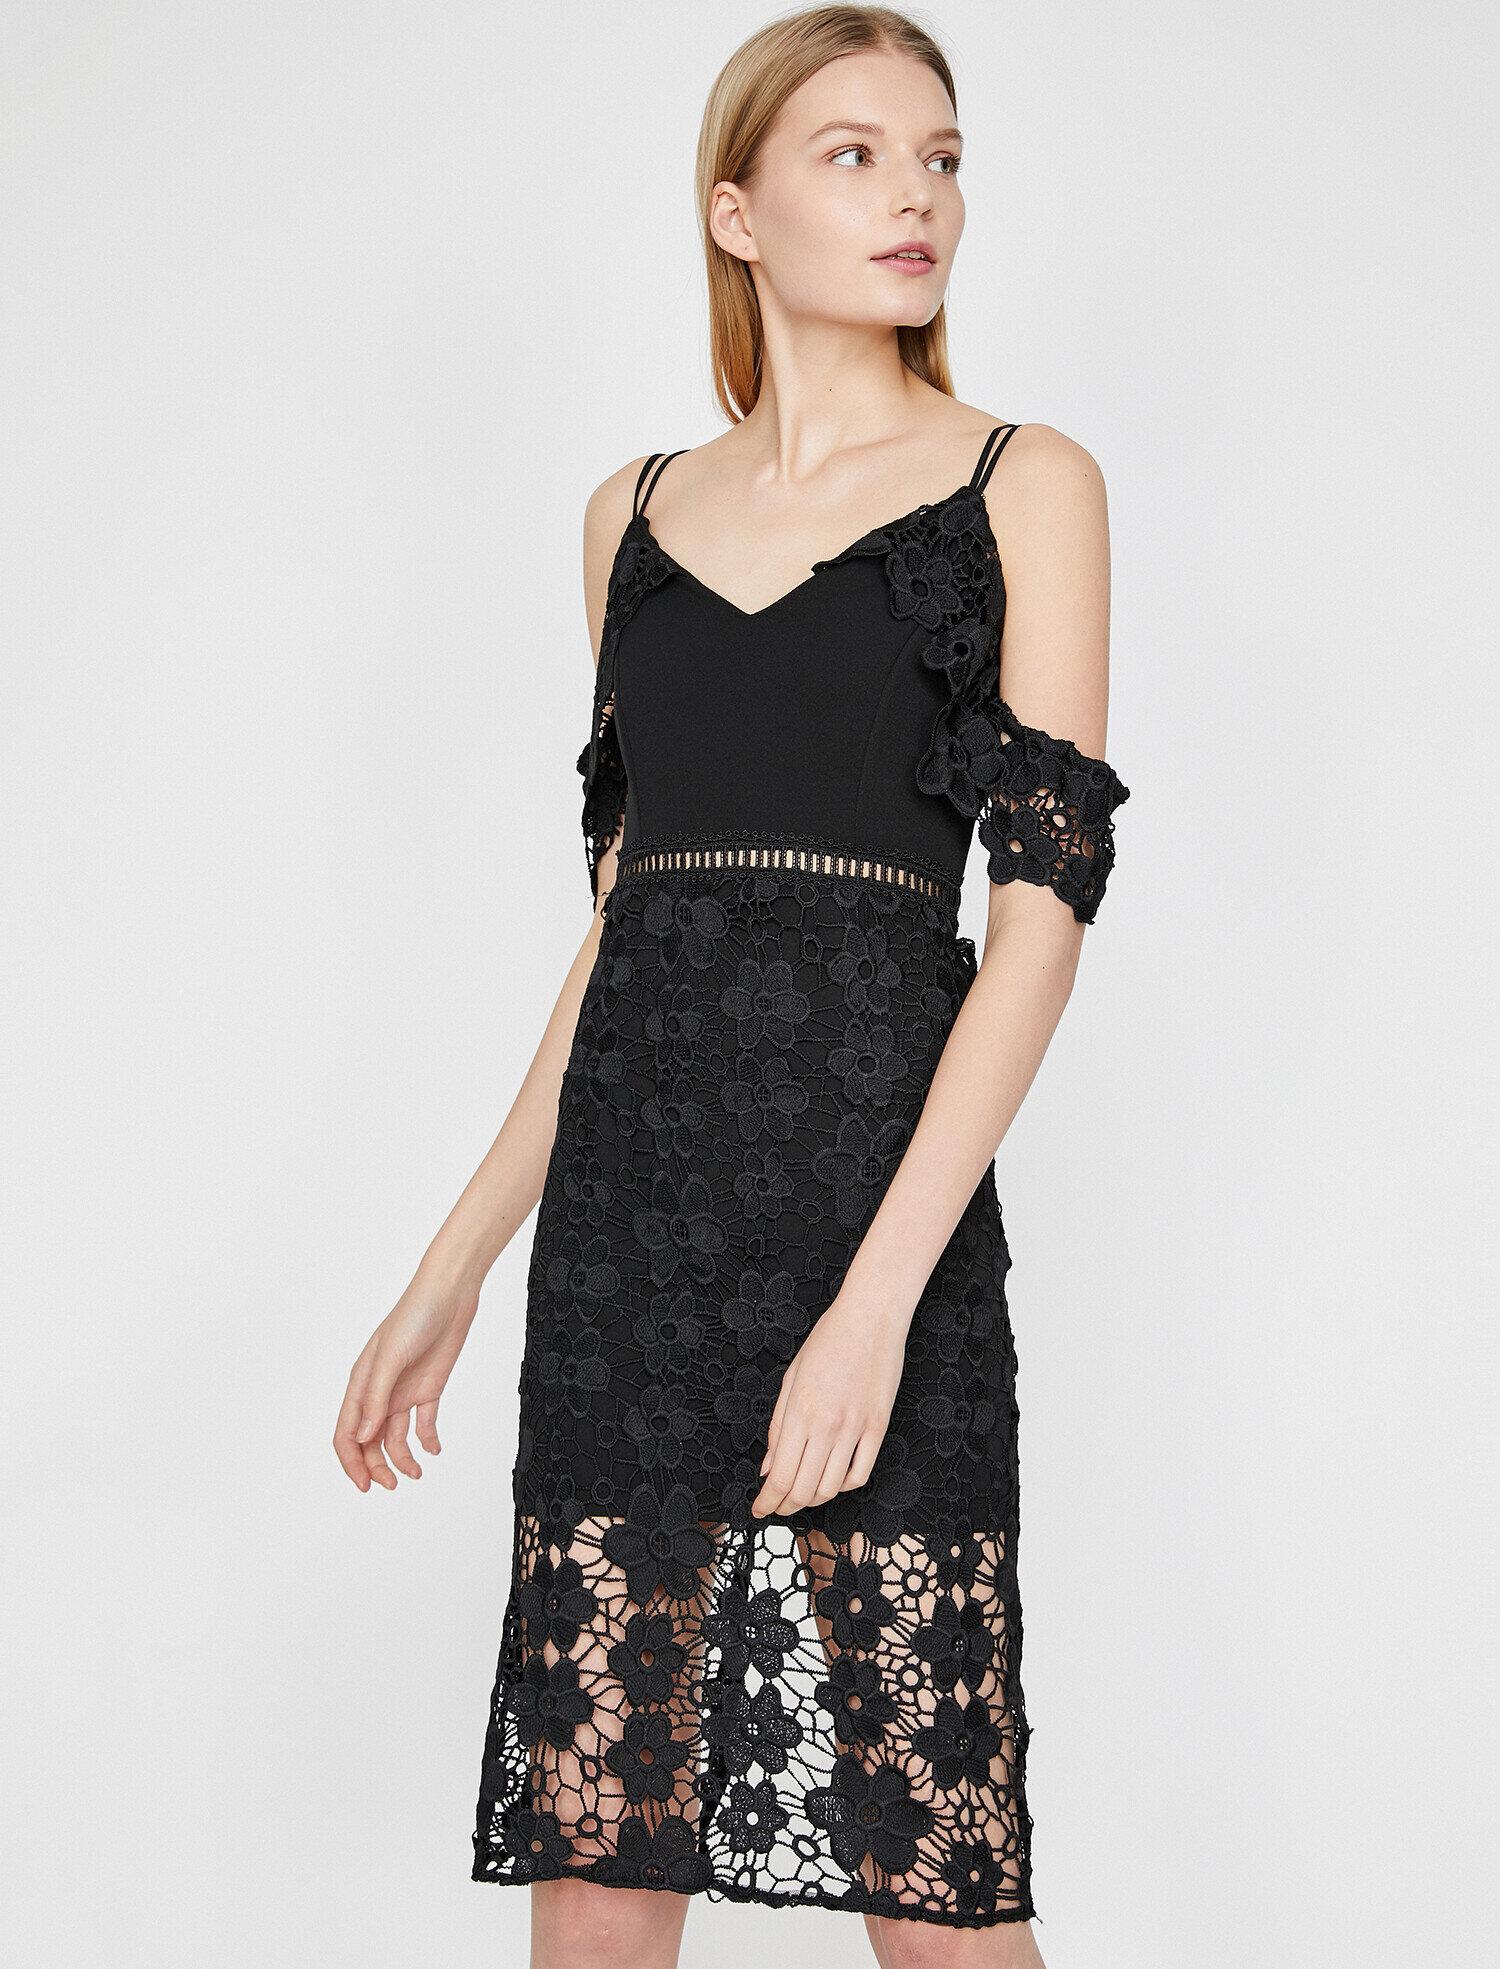 00f58b699 Siyah Bayan Dantel Detaylı Elbise 9YAK84692FK999 | Koton